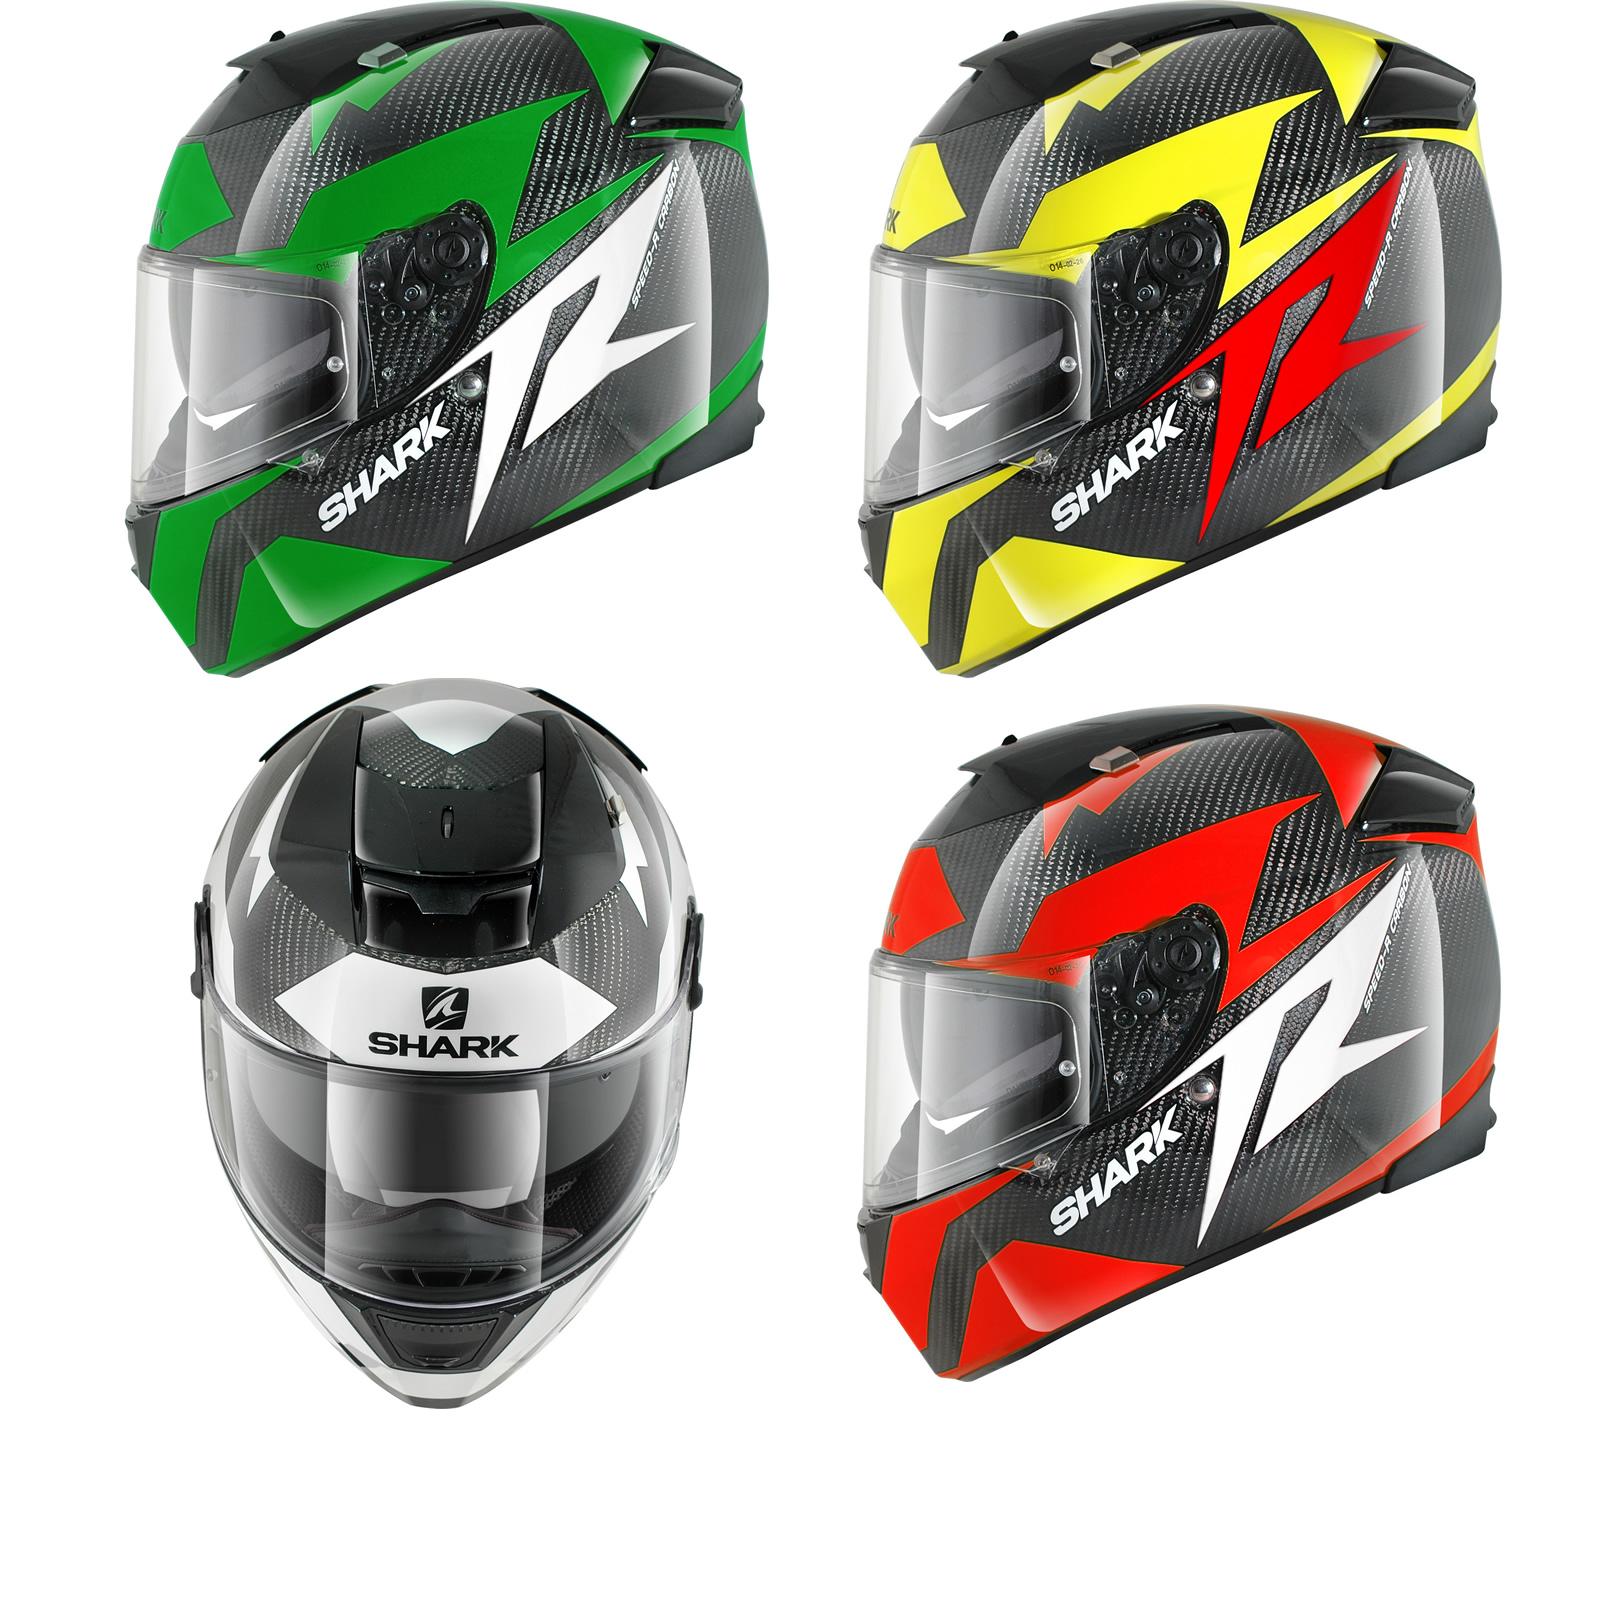 shark speed r carbon run motorcycle helmet speed r. Black Bedroom Furniture Sets. Home Design Ideas